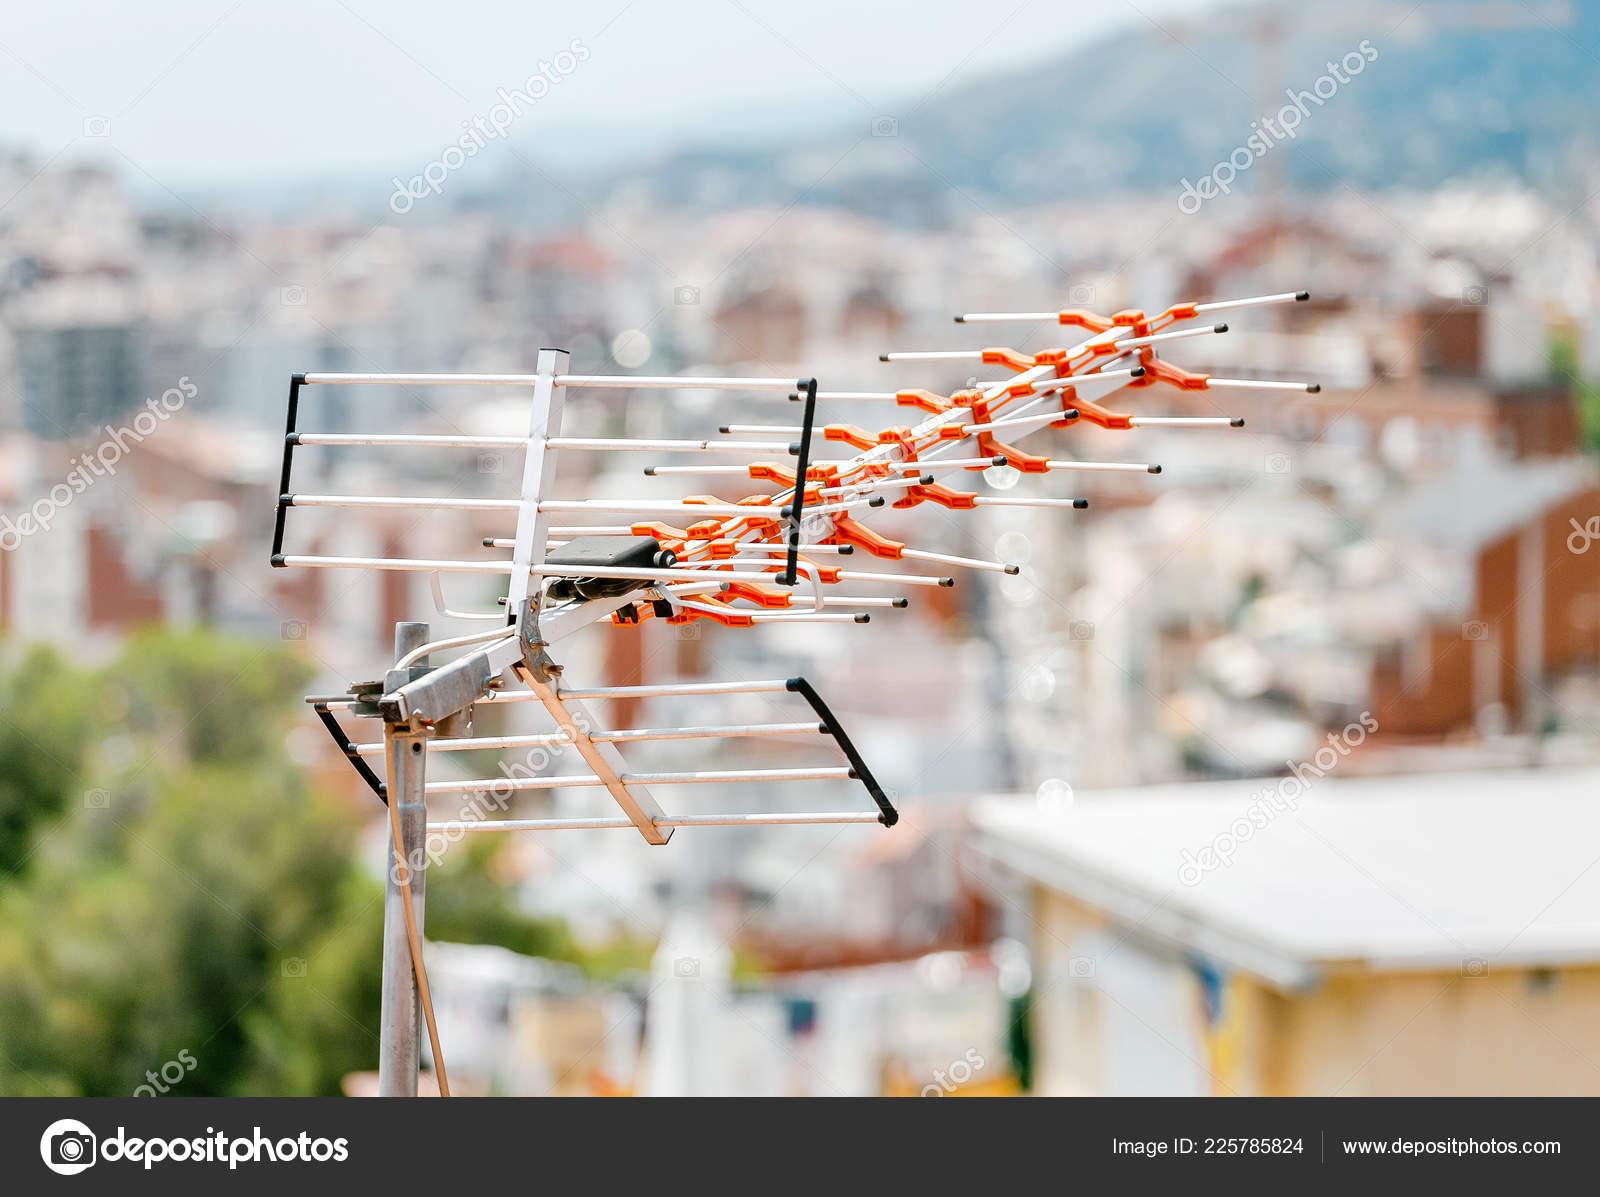 Awe Inspiring Antennas Roof House Stock Photo C Frantic00 225785824 Wiring Database Lukepterrageneticorg